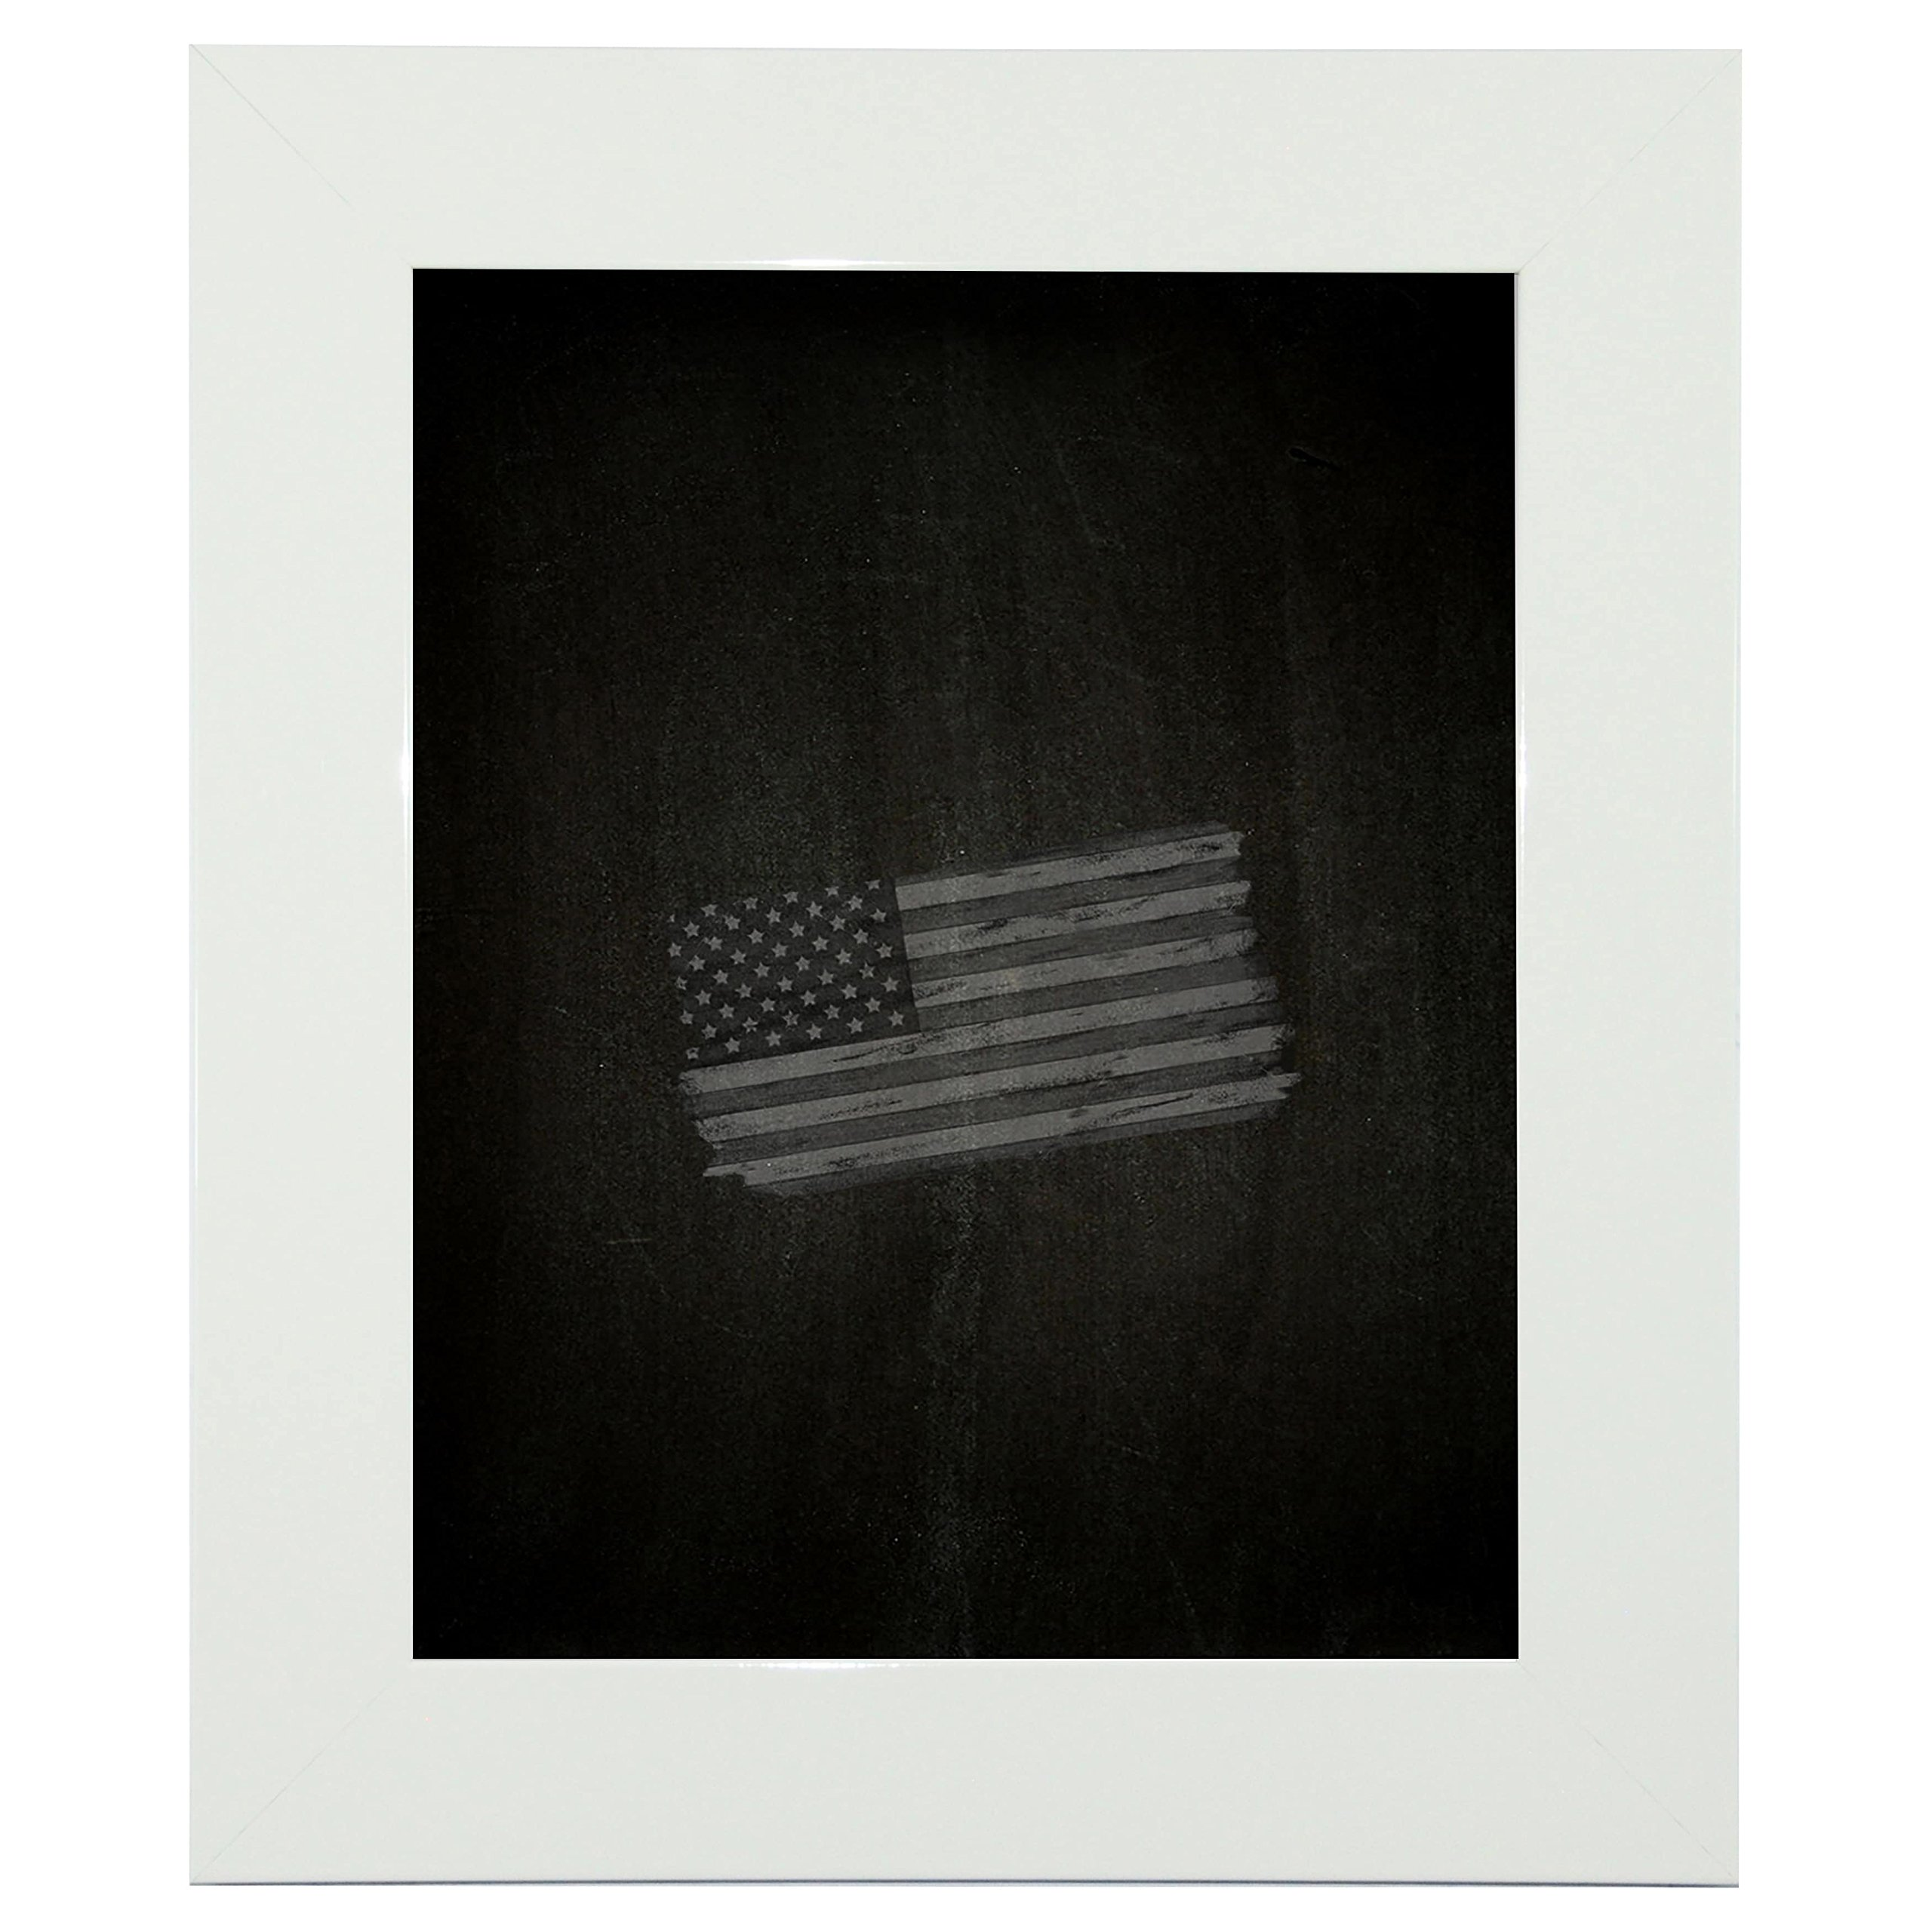 Rayne Mirrors American Made Rayne Delta White Blackboard/ Chalkboard Exterior Size: 30 x 36 by Rayne Mirrors